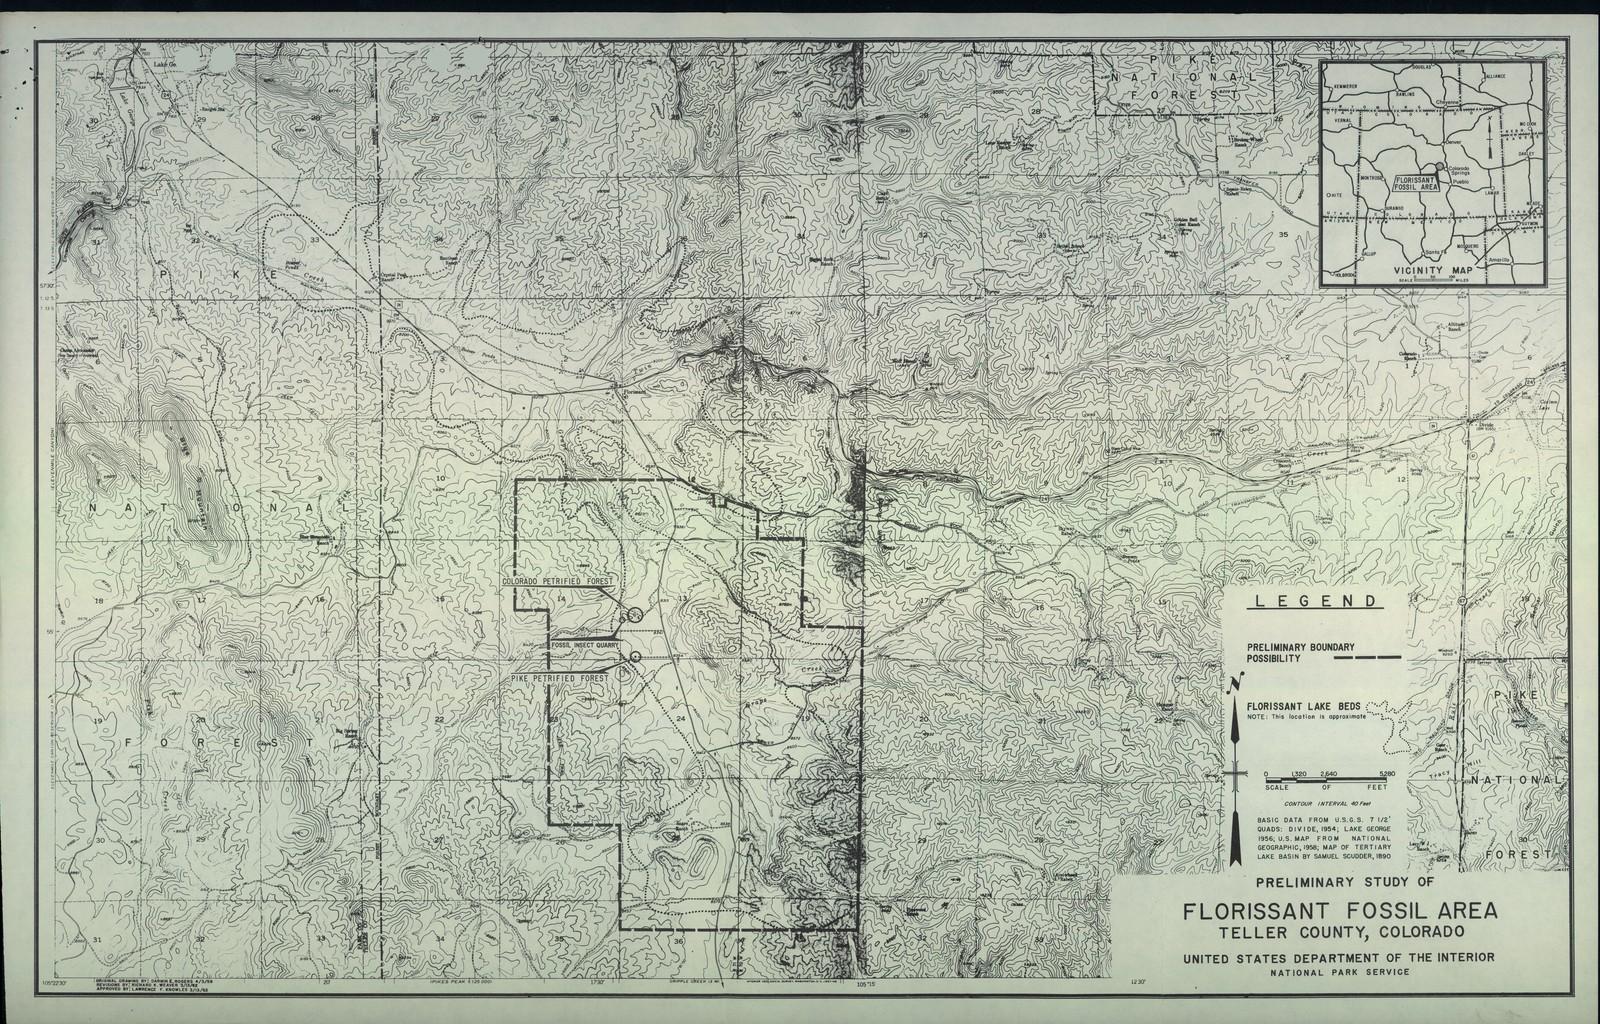 Preliminary Study Of Florissant Fossil Area Teller County Colorado